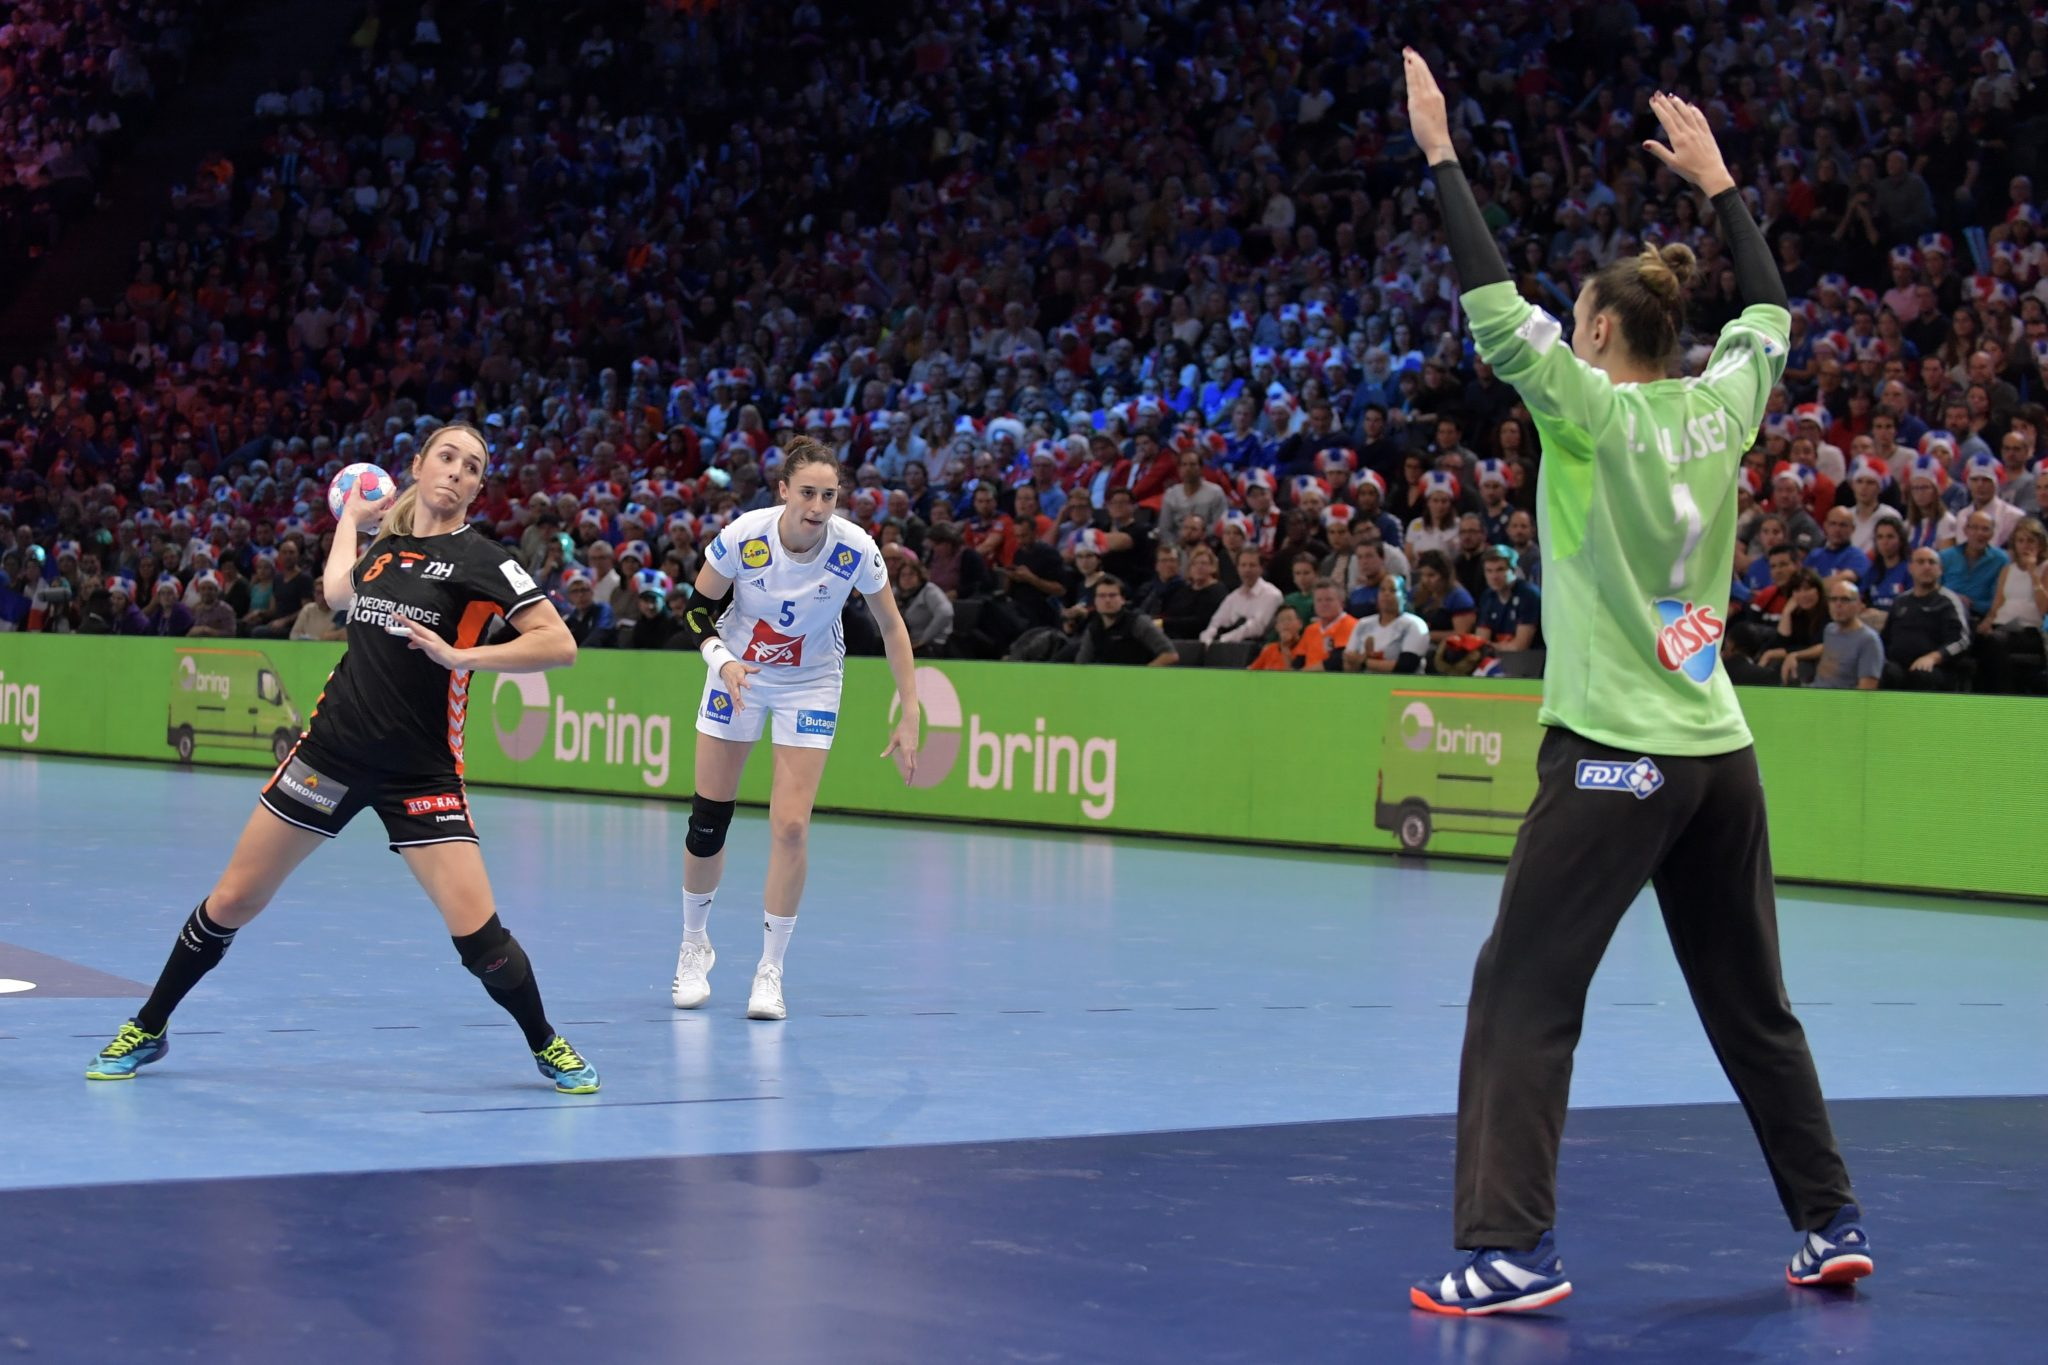 14-12-2018: Handbal: Vrouwen Nederland V Frankrijk : Parijs EK Handbal In Frankrijk, 1/2 Finale Nederland-Frankrijk Lois Abbingh #8 NED Met Een Strafbal